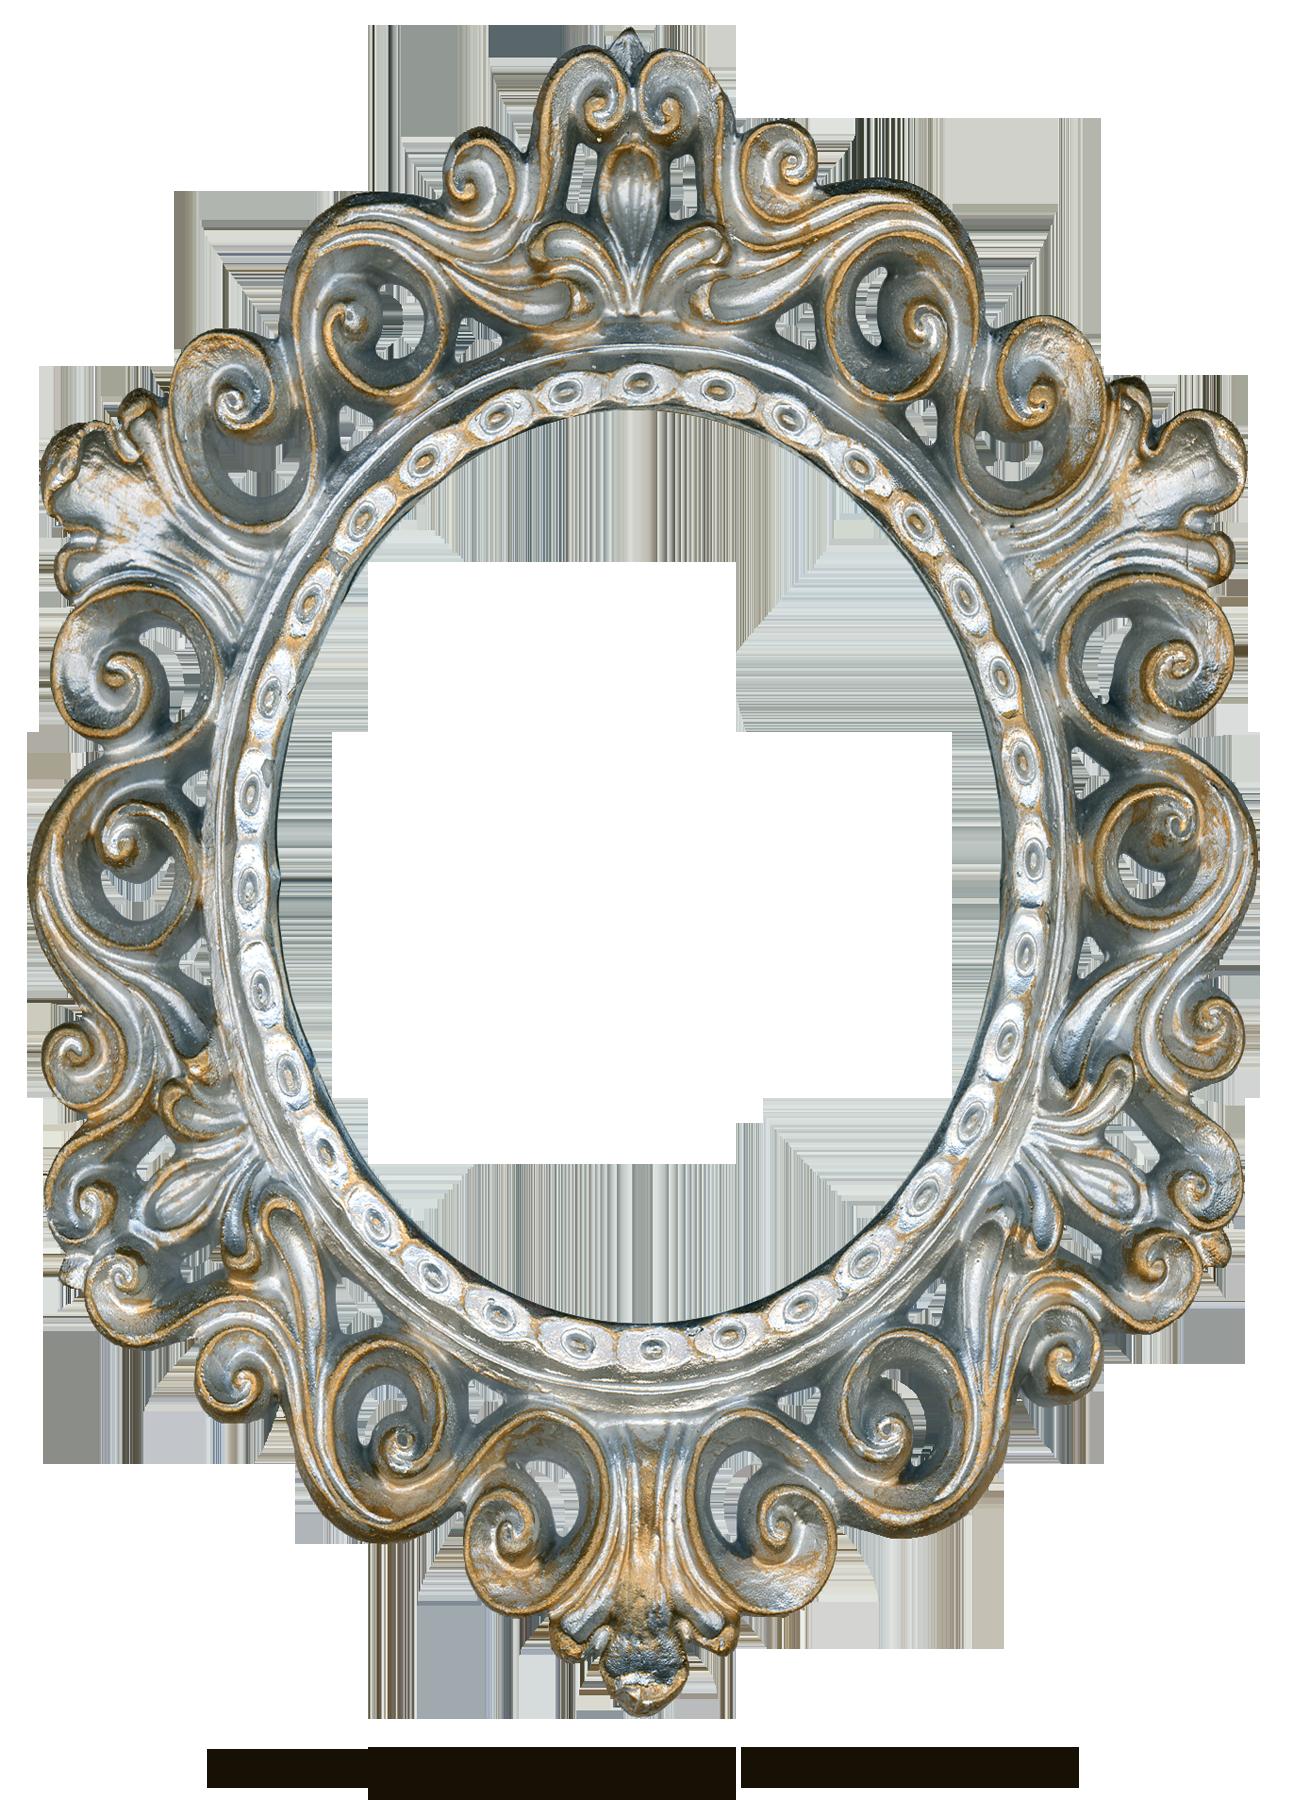 Pin By Khamsing Thammakhan On Free Frames Gold Frame Vintage Frames Vintage Silver